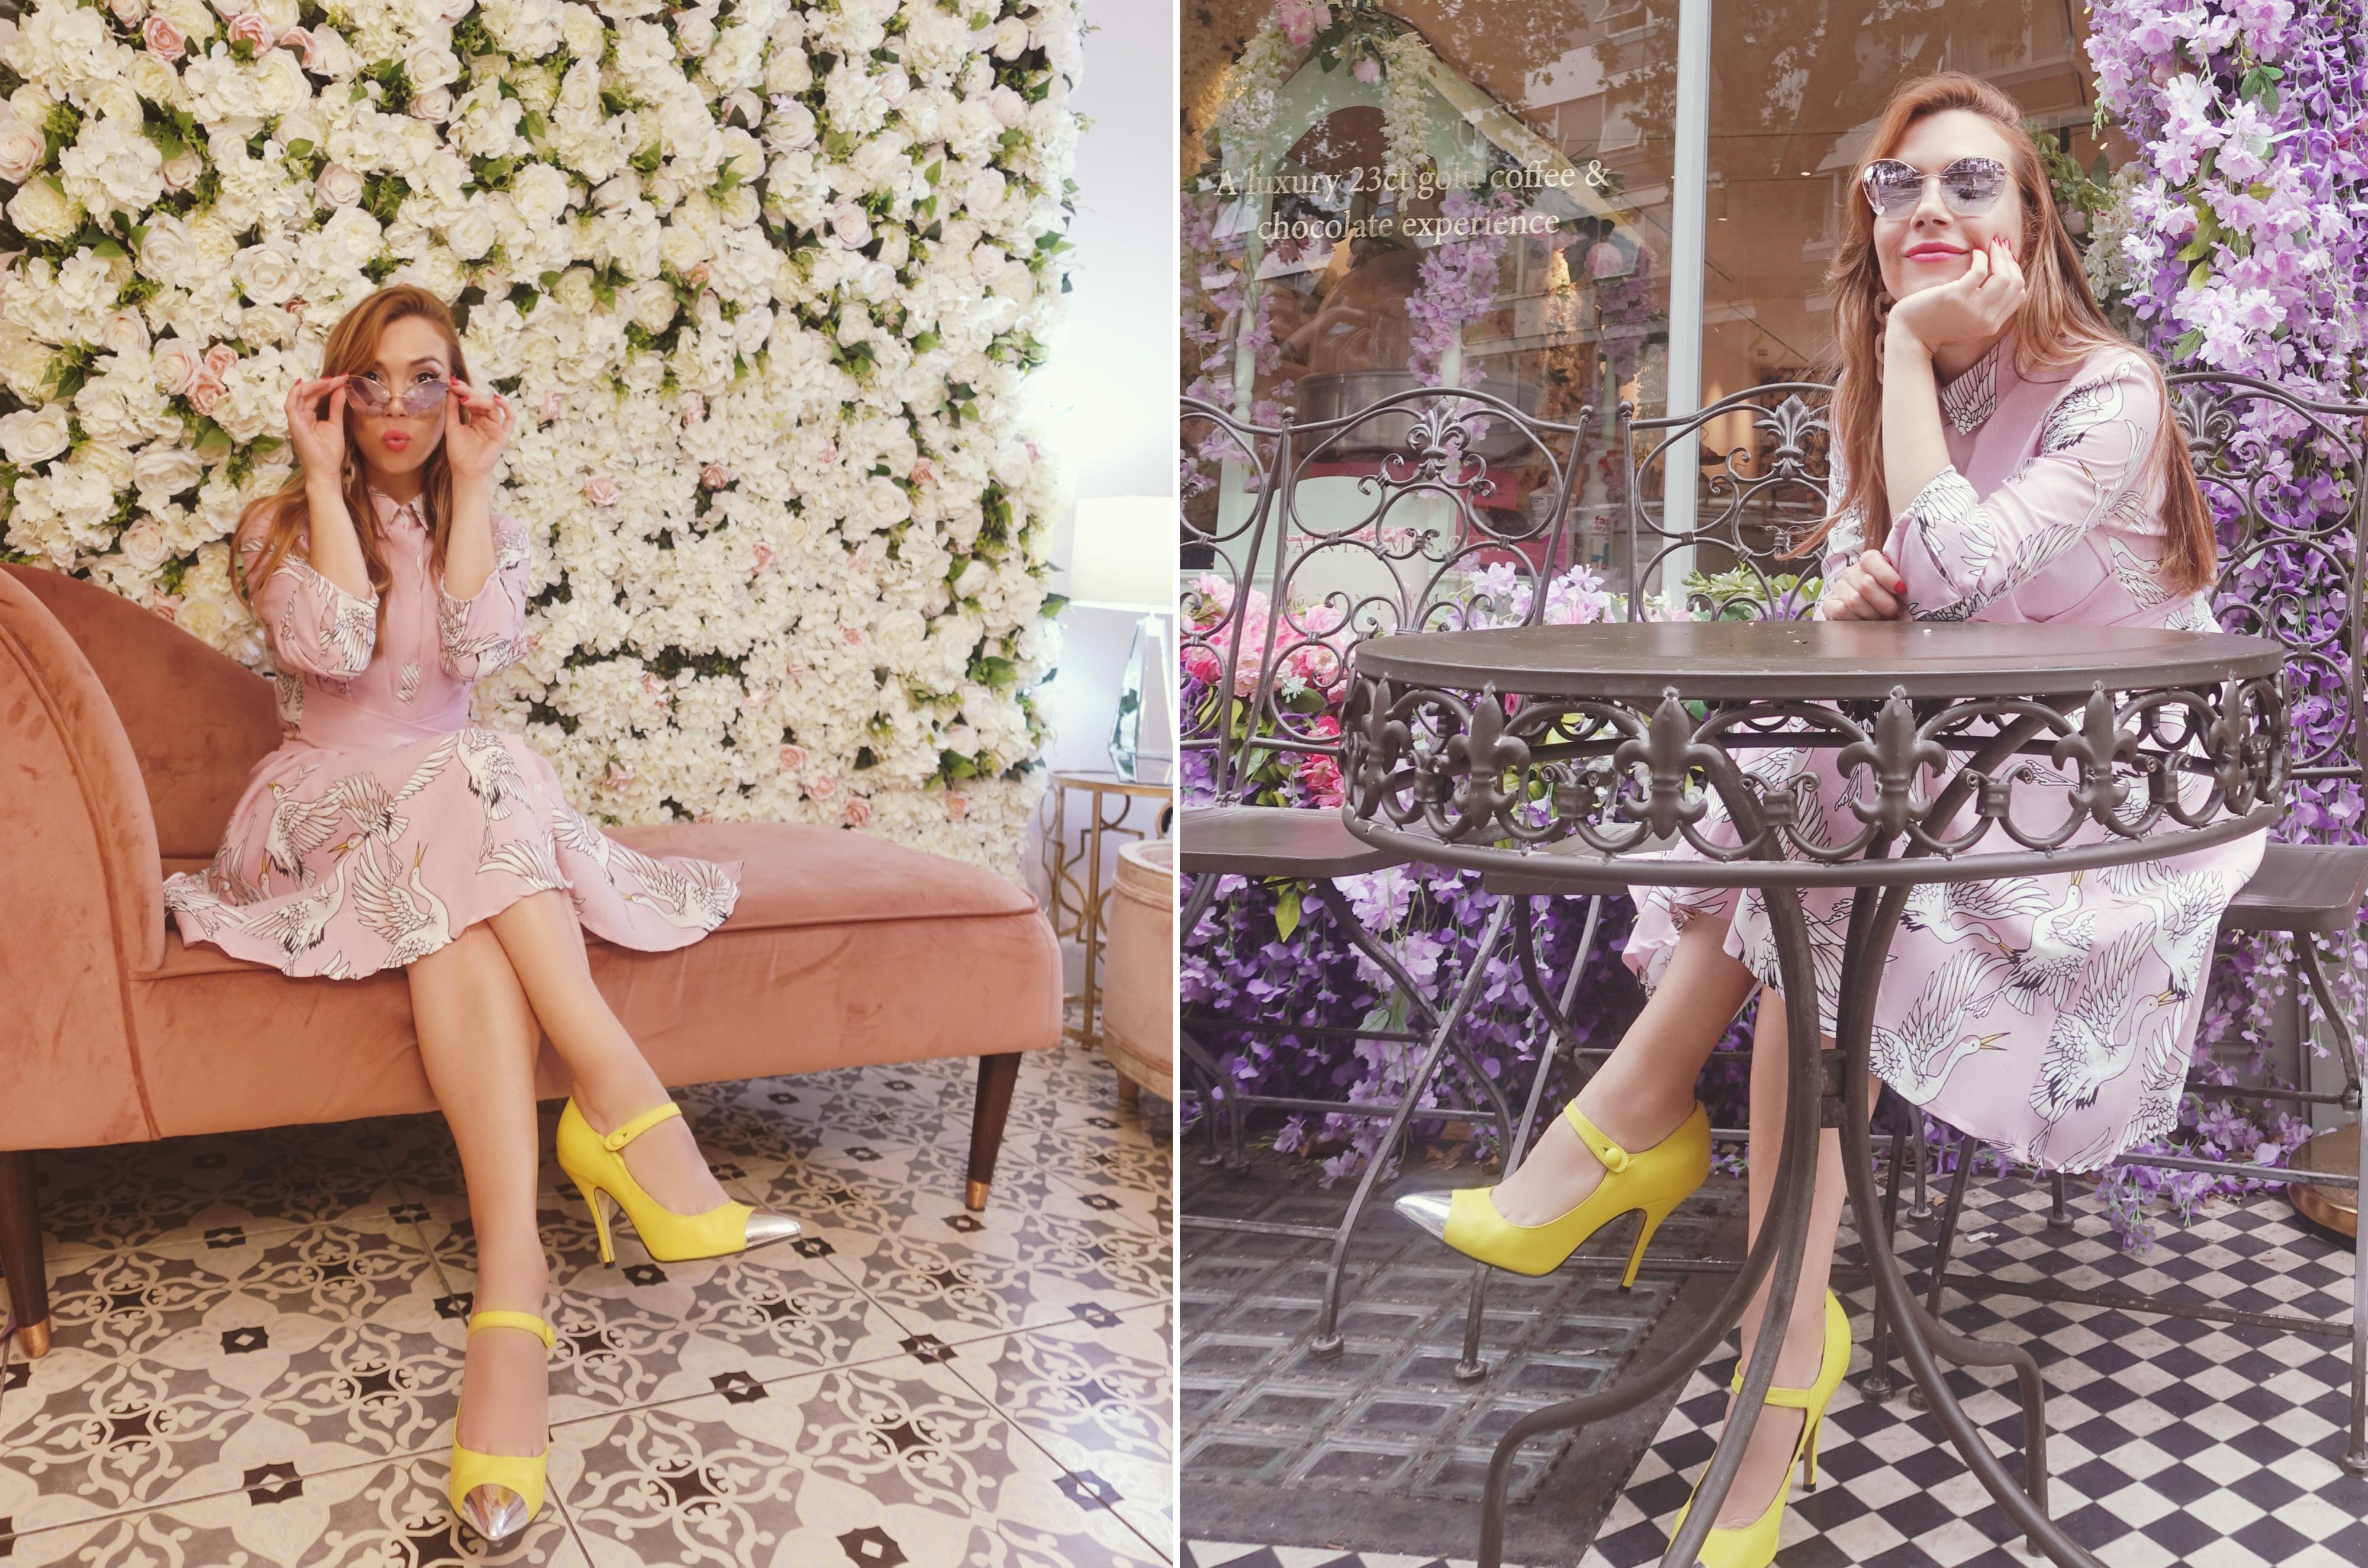 ChicAdicta-blog-de-moda-PiensaenChic-fashionista-Smile-dress-blog-de-moda-london-cafe-saintaymes-Chic-Adicta-Piensa-en-Chic